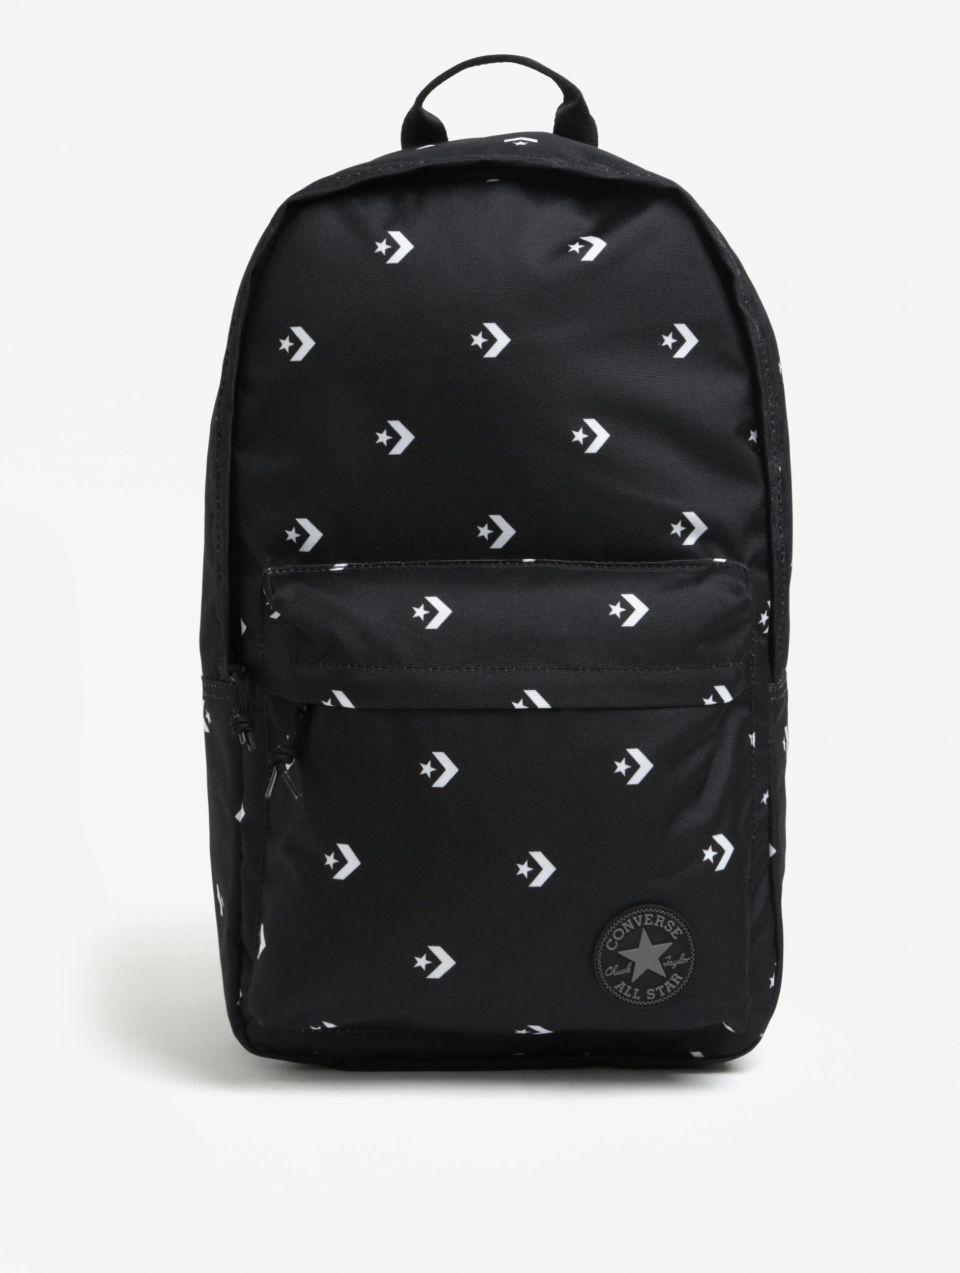 e88058ec2a Čierny batoh s potlačou Converse EDC Poly 19 l značky Converse - Lovely.sk